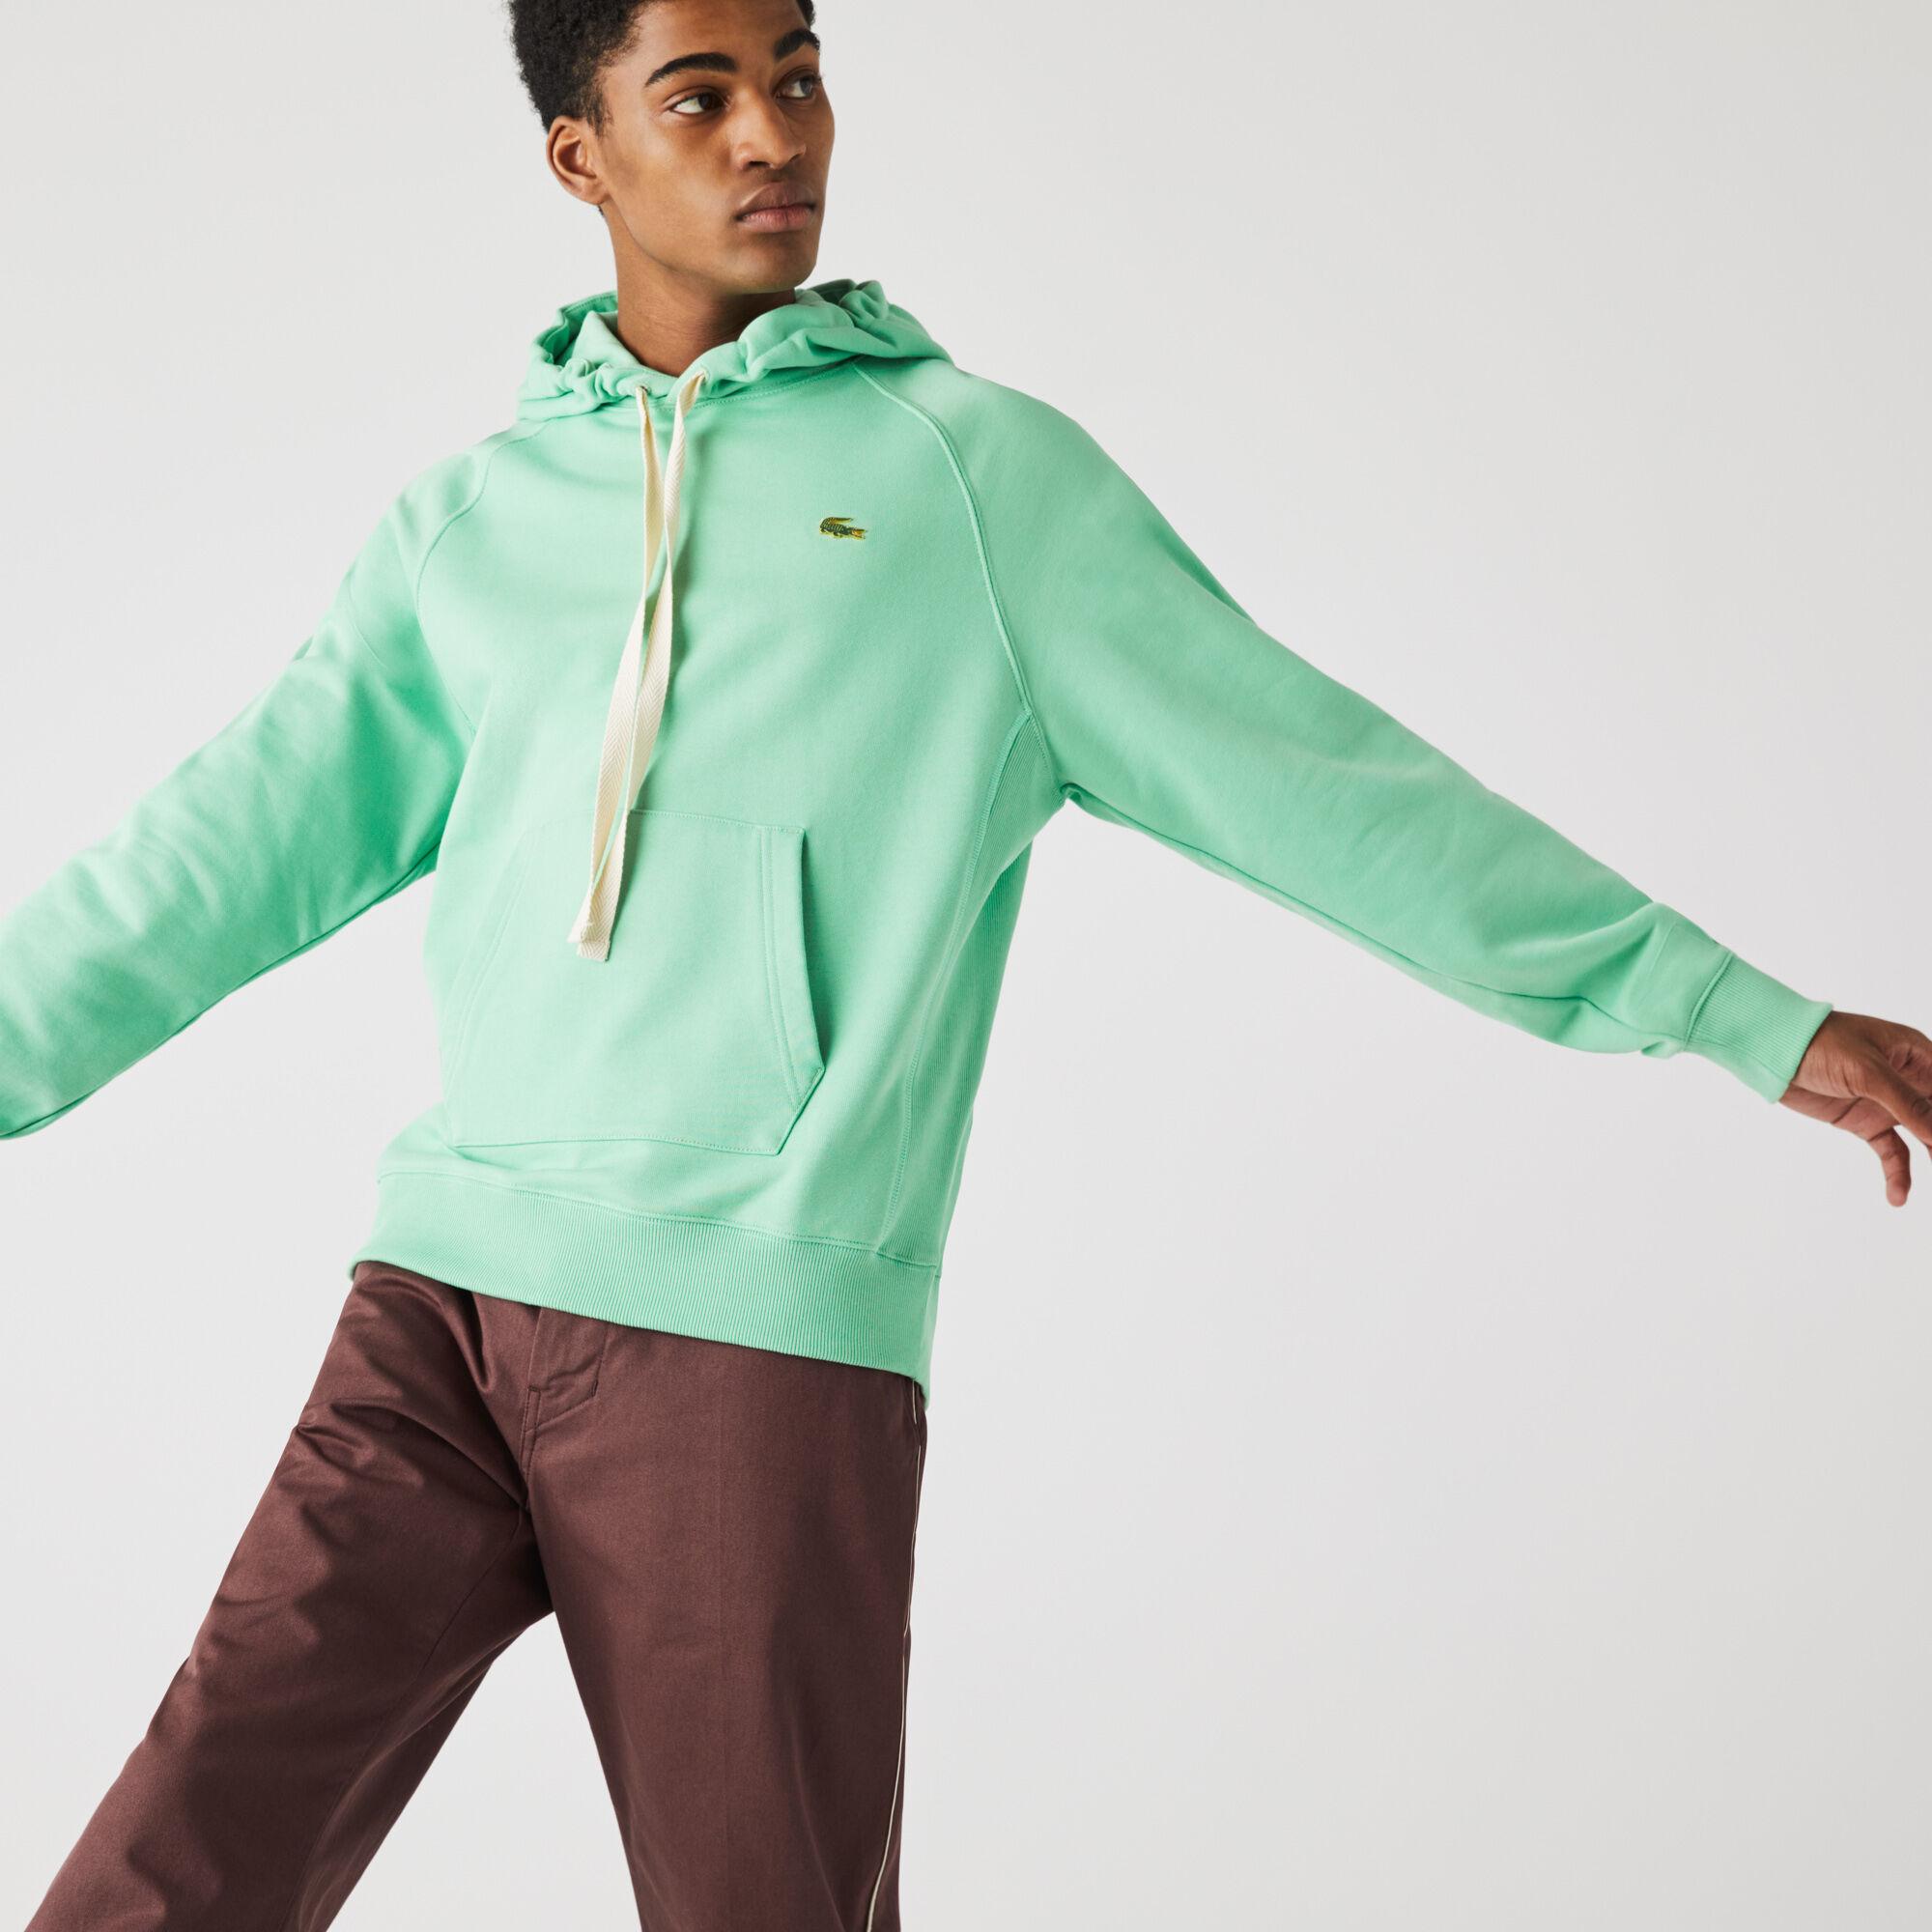 Unisex Lacoste LIVE Hooded Cotton Sweatshirt